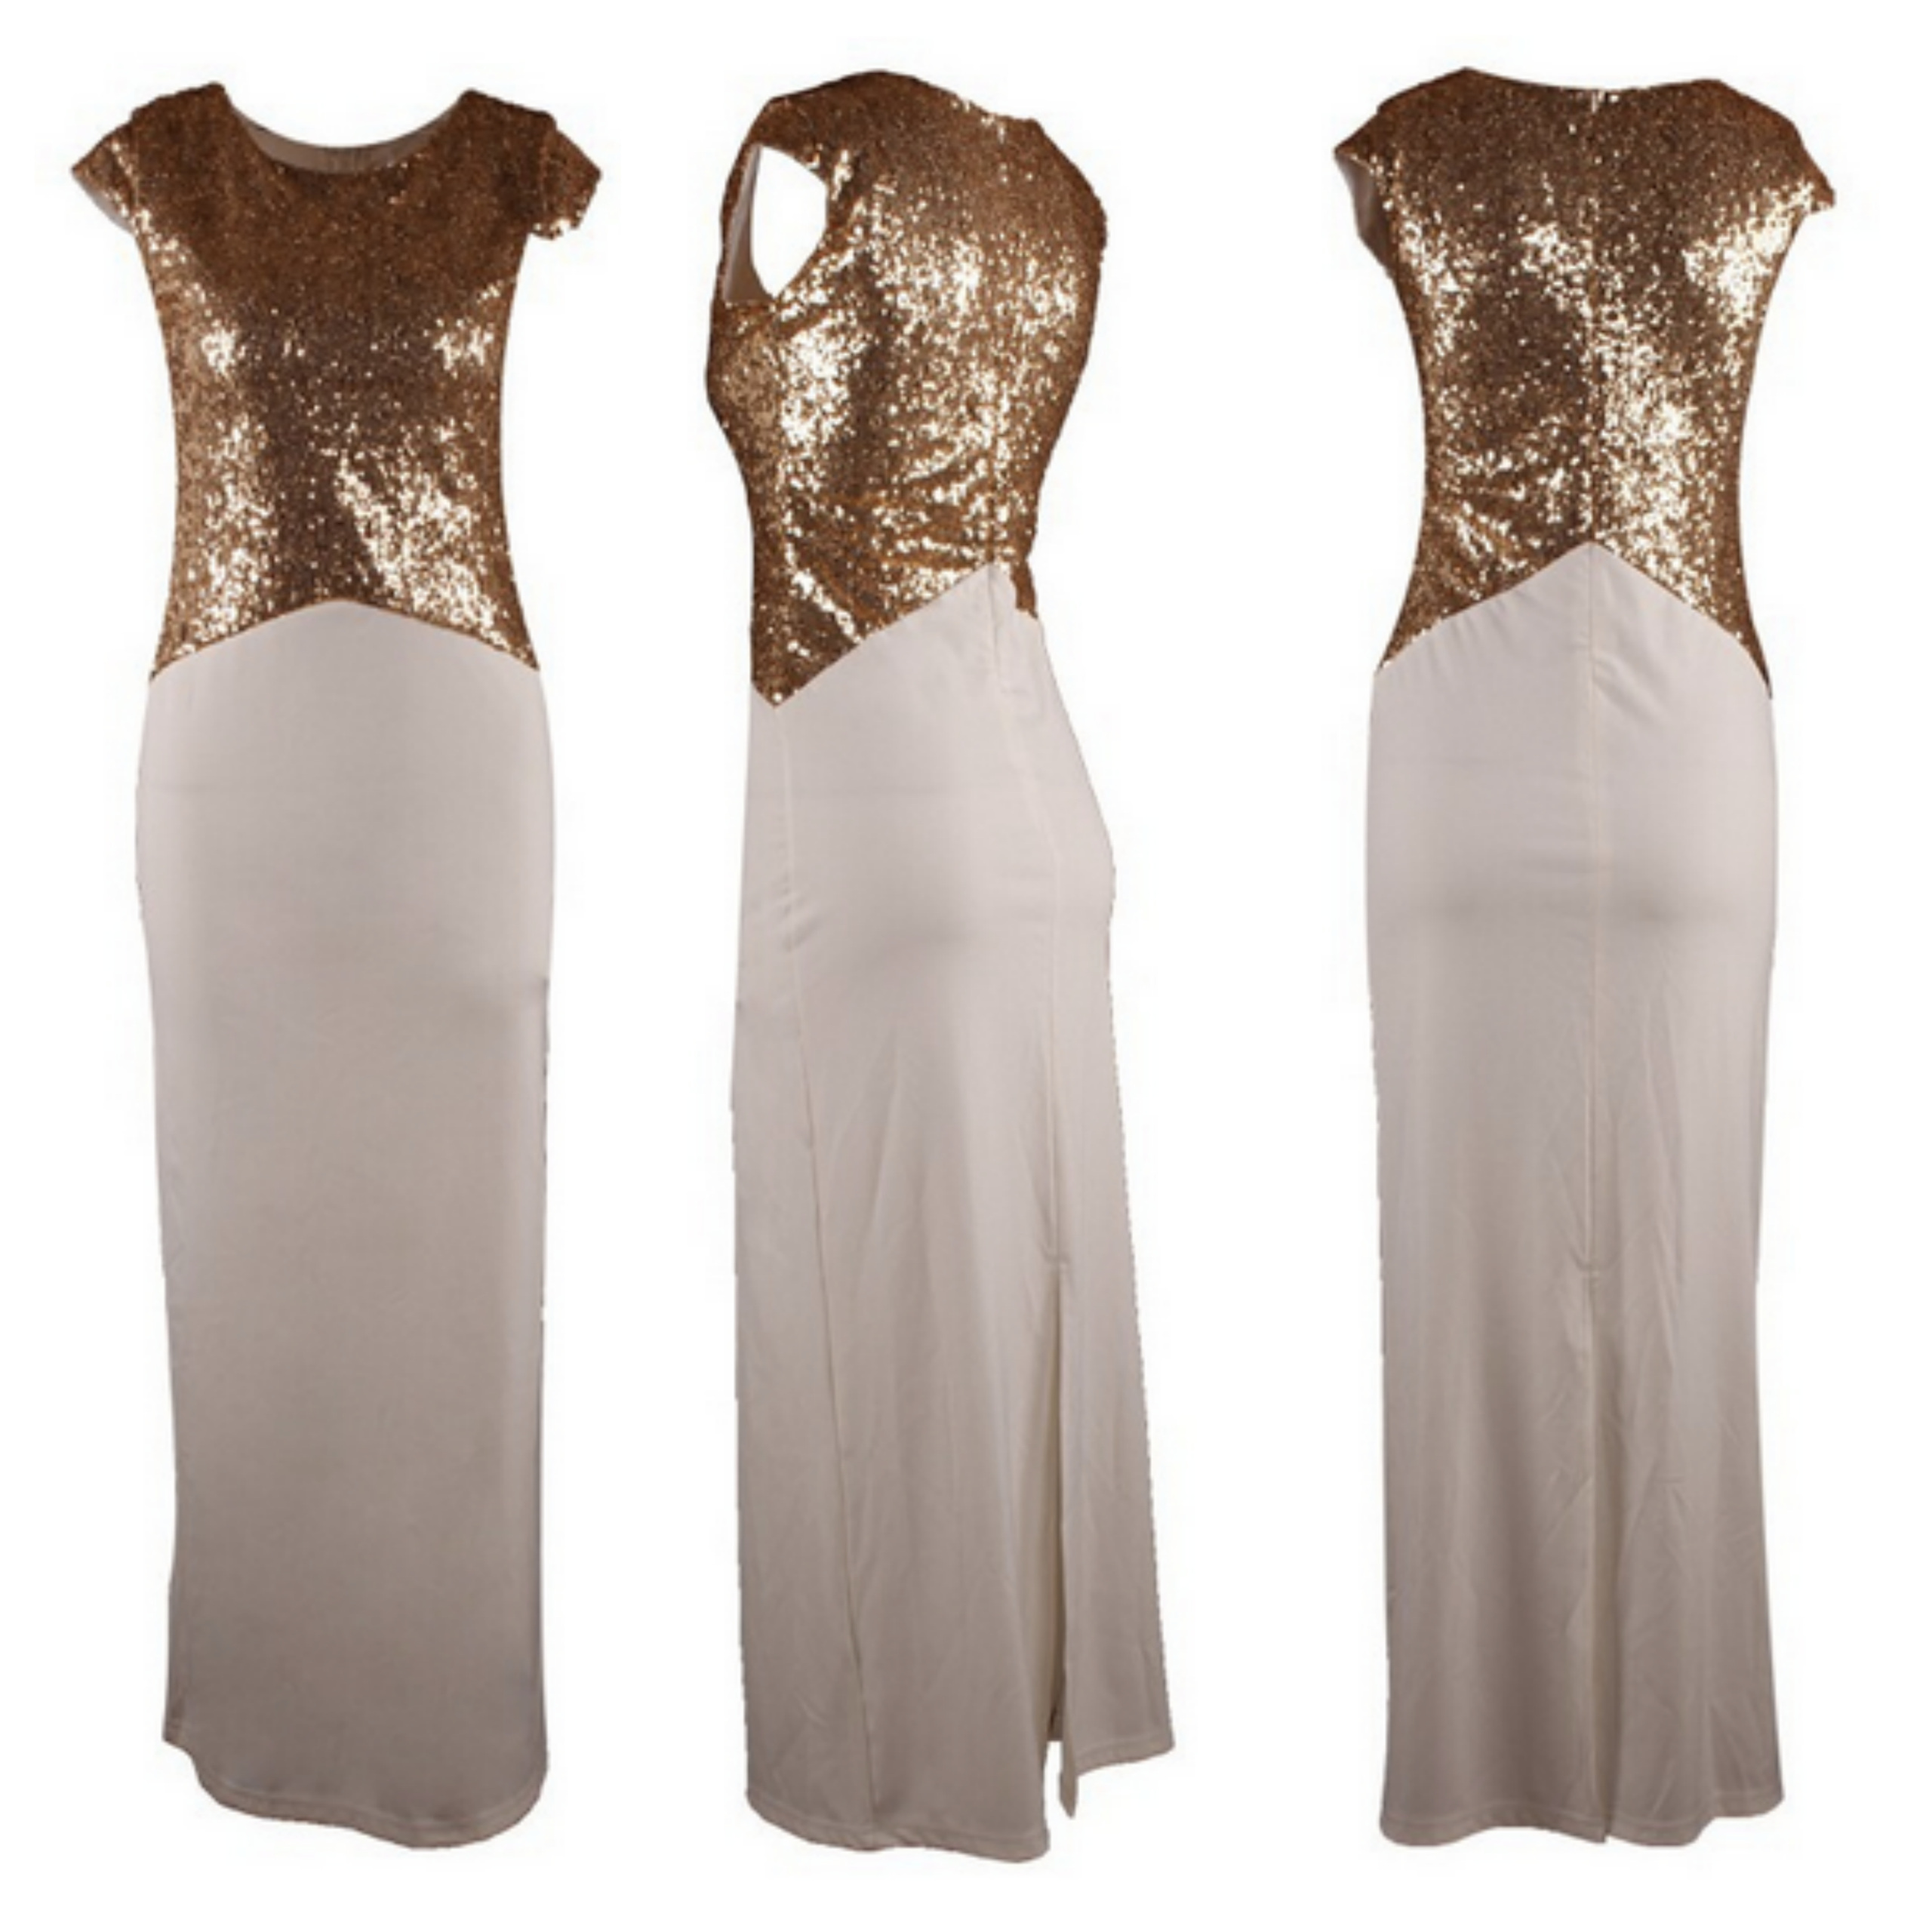 Suave sequin maxi dress